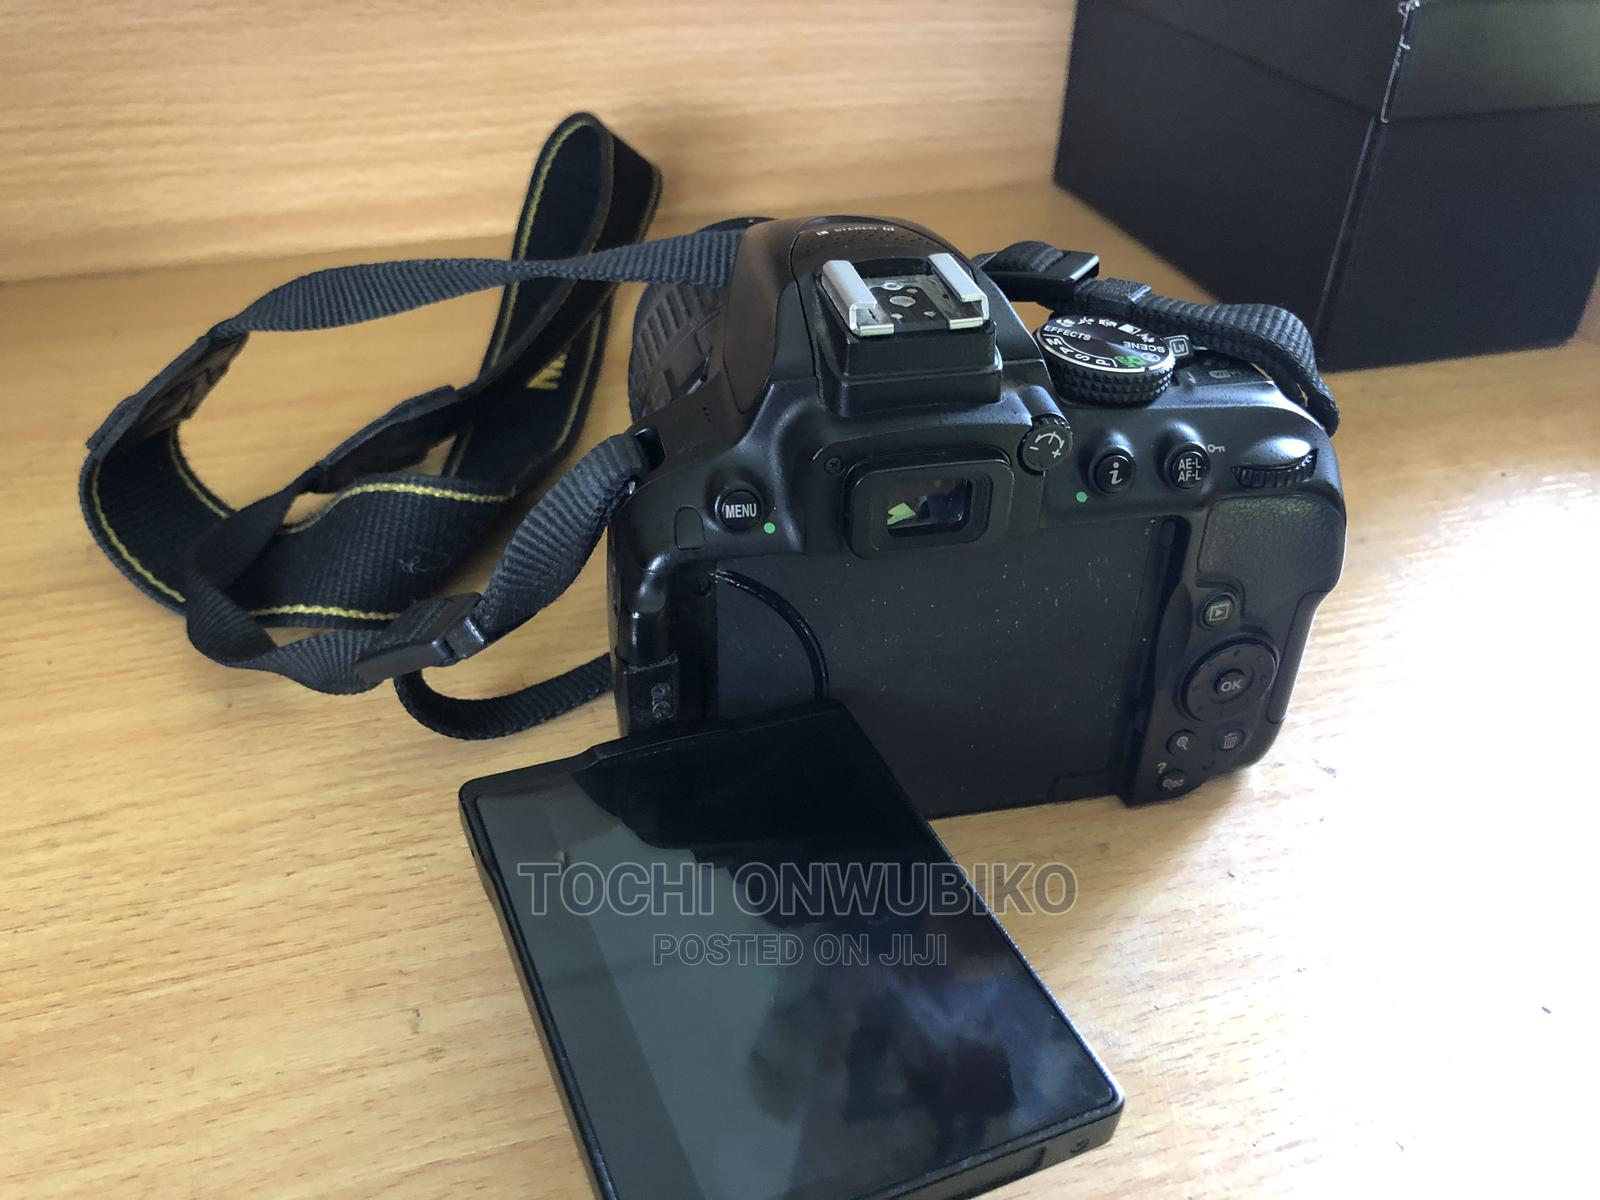 Archive: Nikon D5300 DSLR With 18-55mm Kit Lens